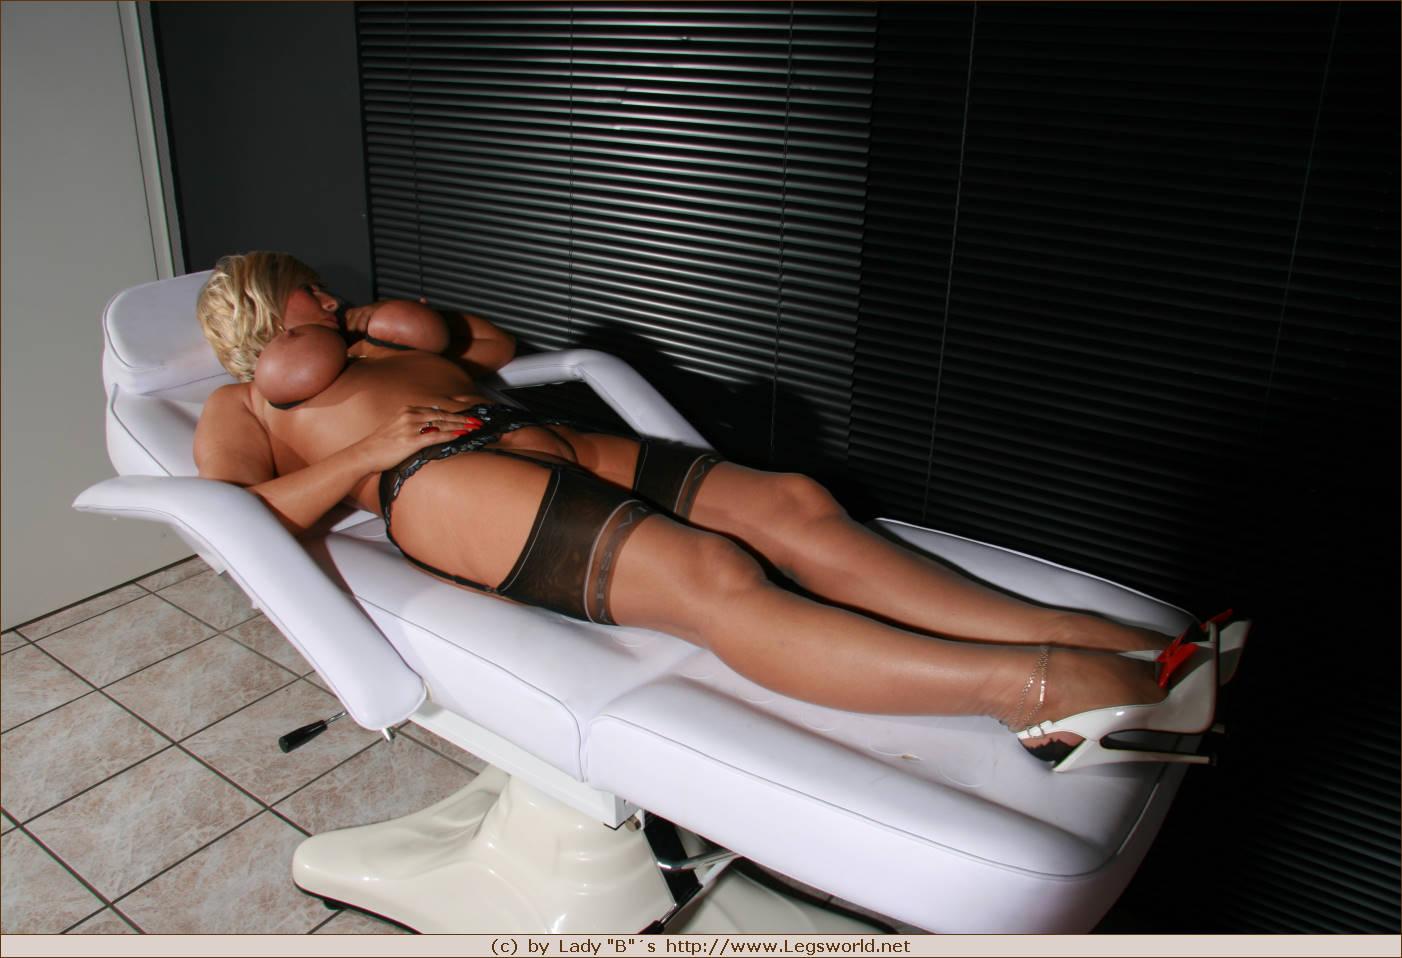 ... hot mom mature girl granny sex mature porn mature sexy mature fuck